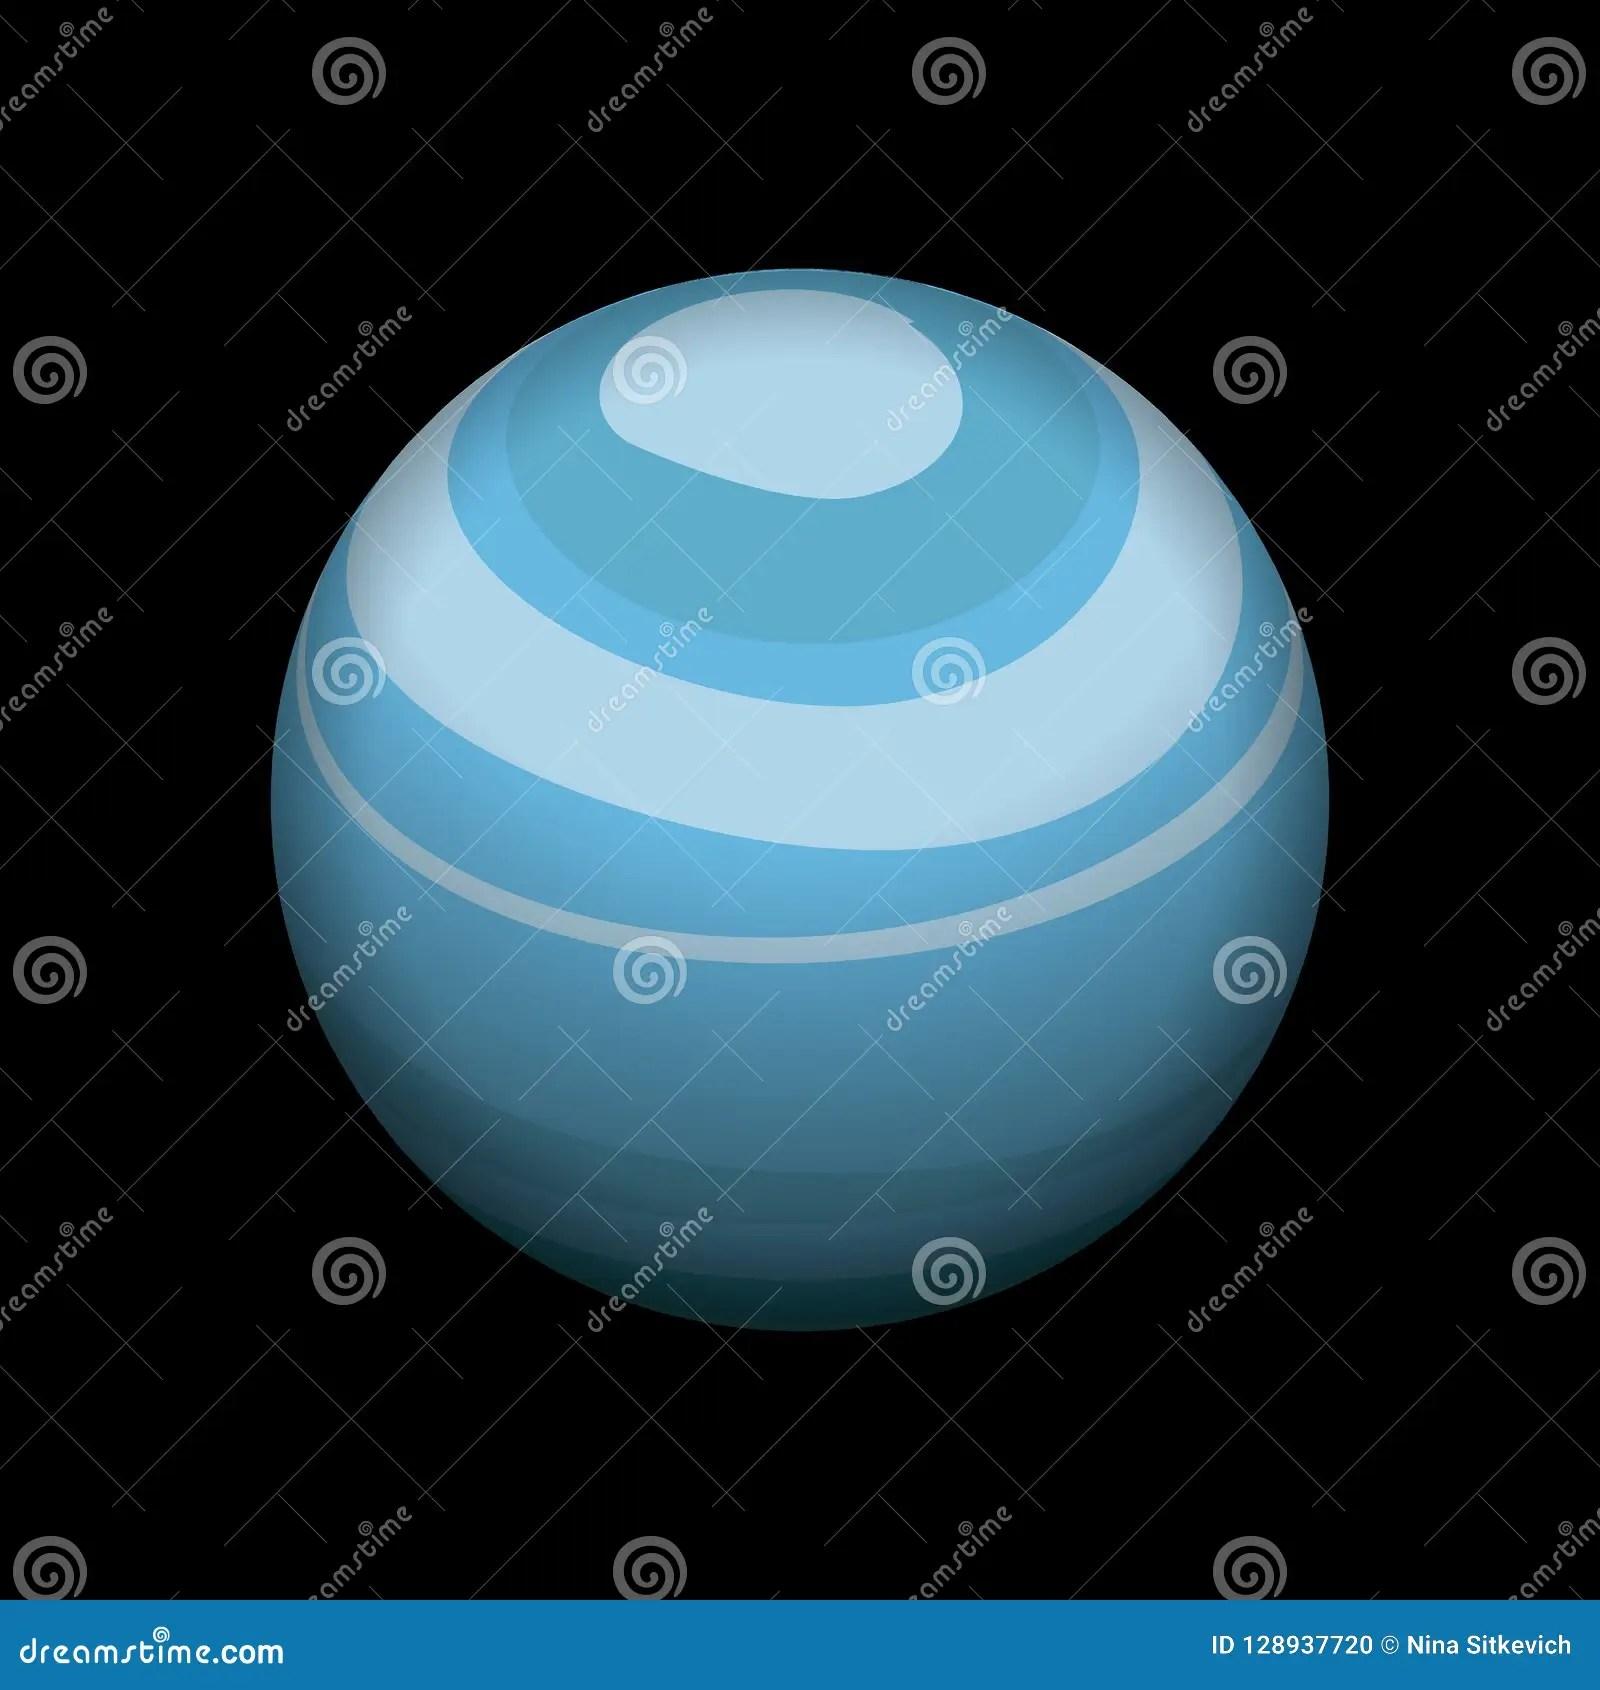 hight resolution of uranus icon isometric style